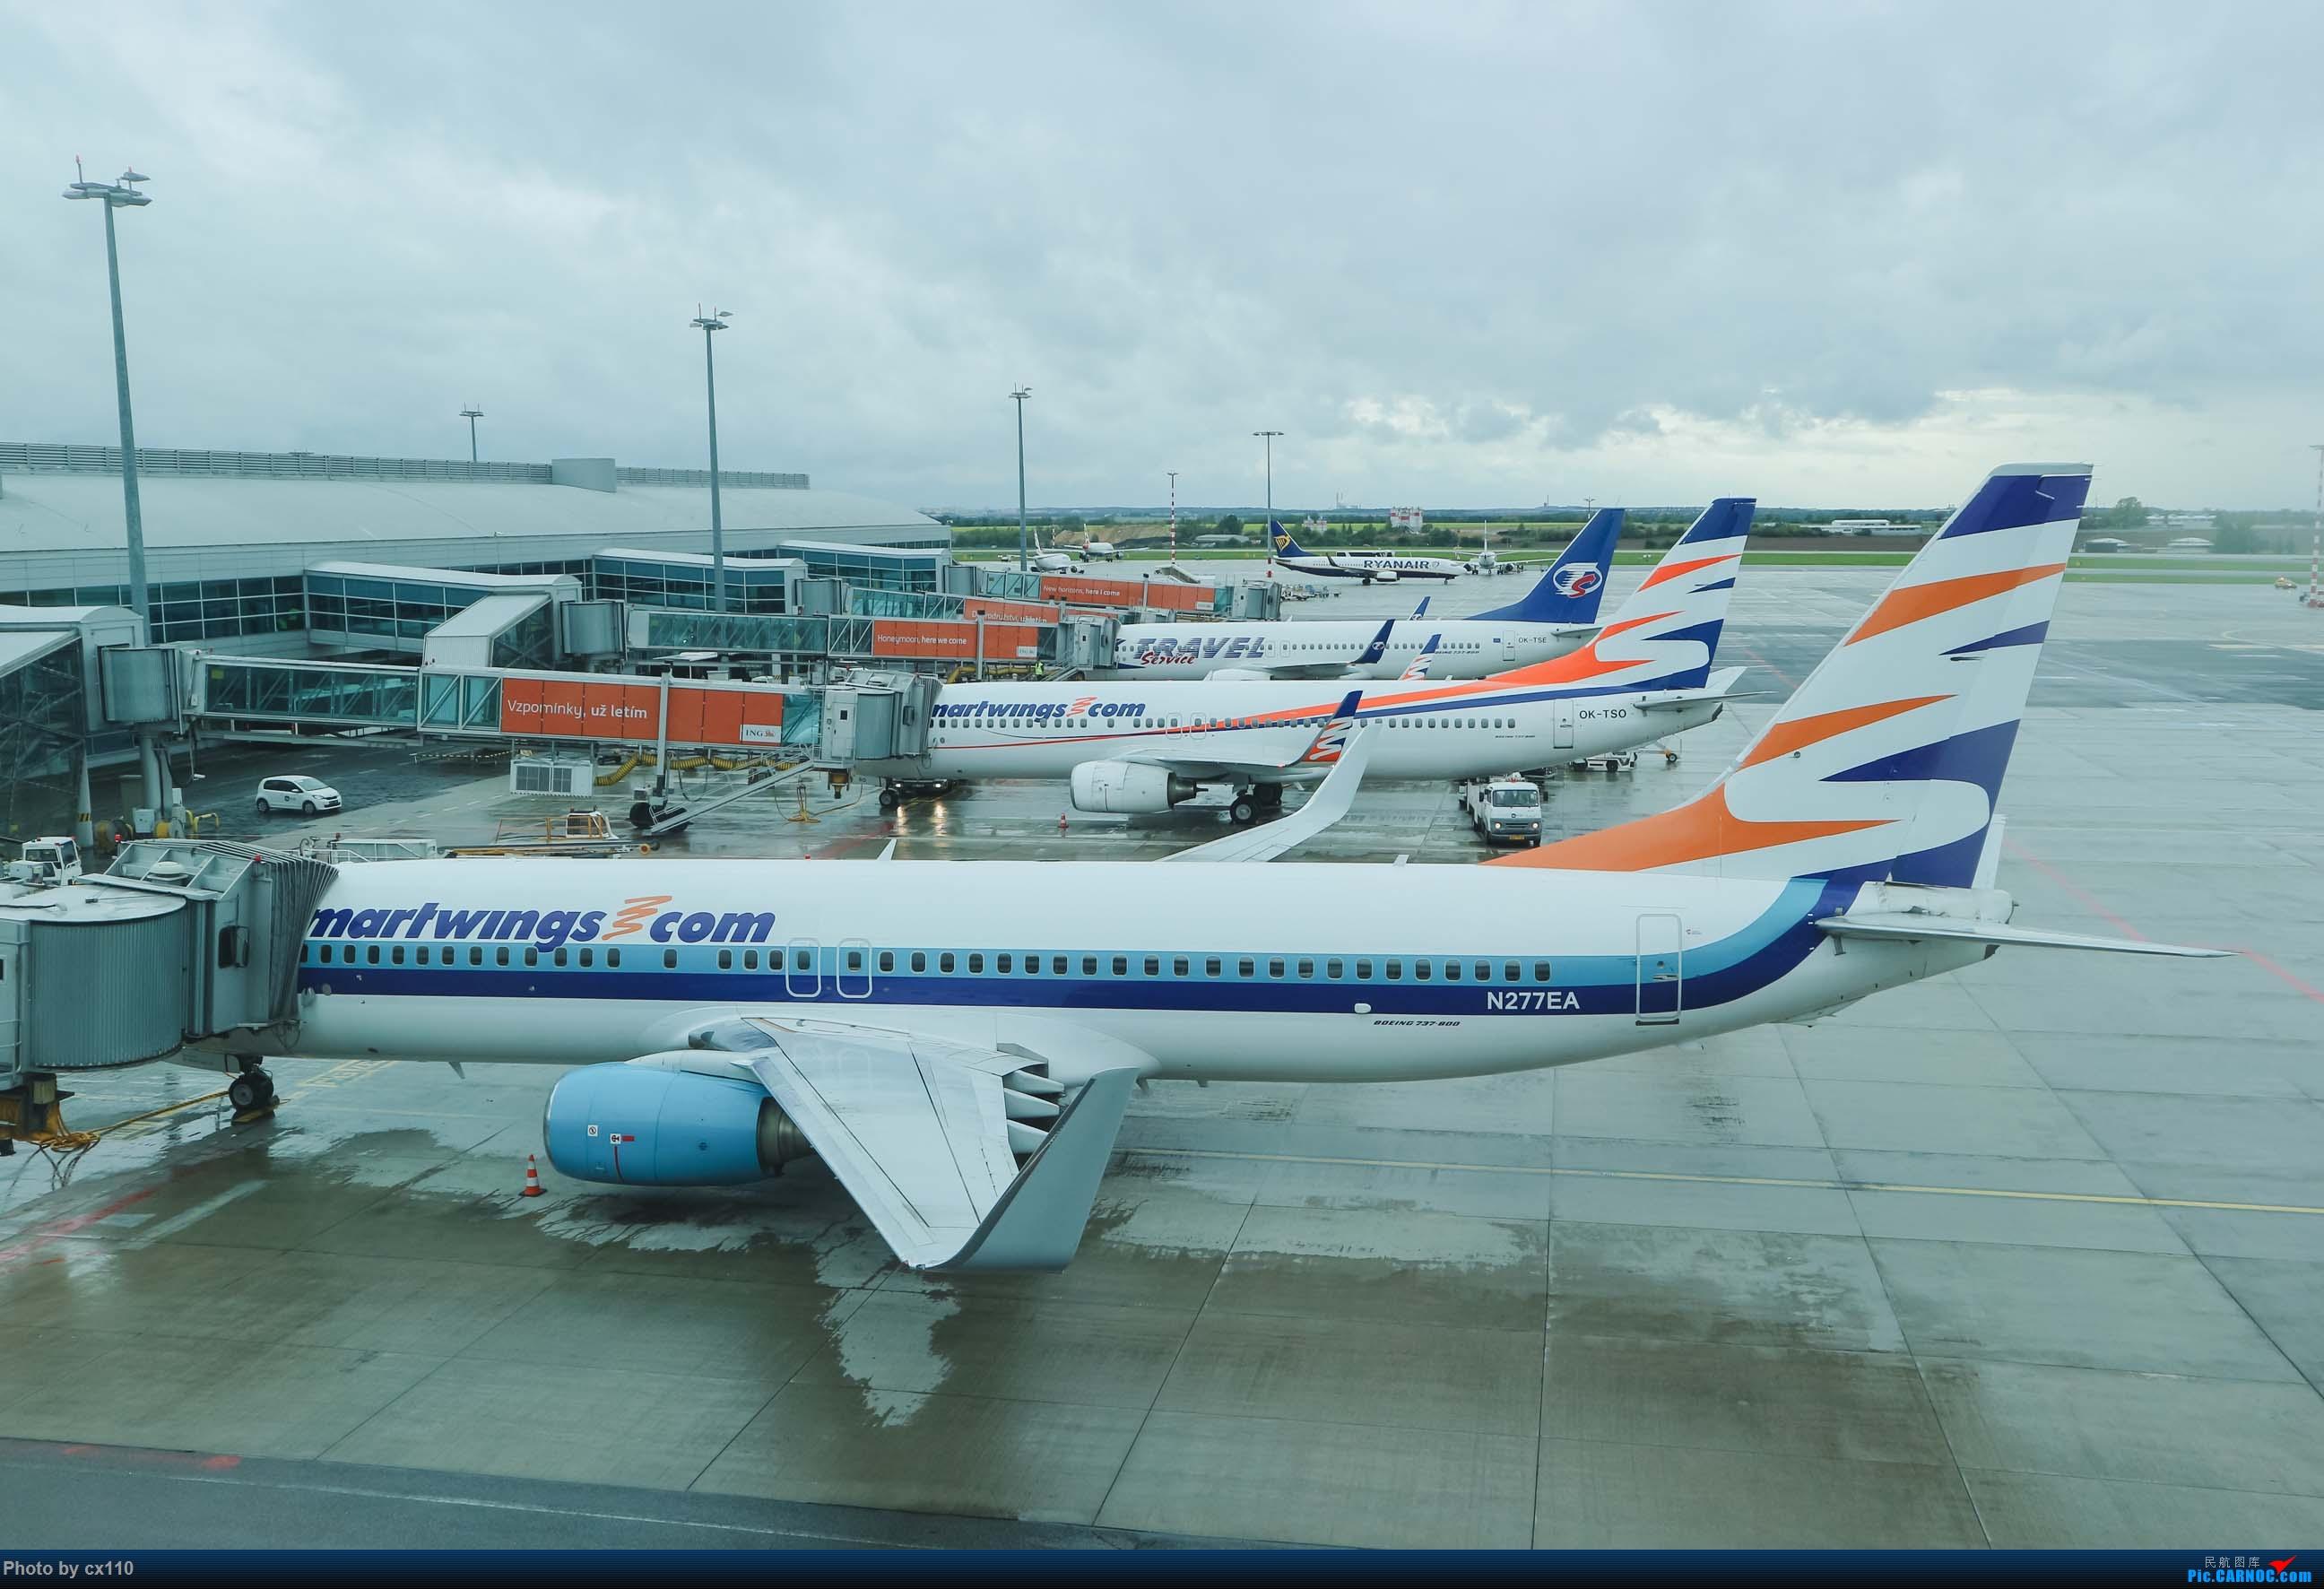 Re:[原创]欧洲机场拍机记-柏林/赫尔辛基/布拉格 BOEING 737-800 N277EA 捷克布拉格机场